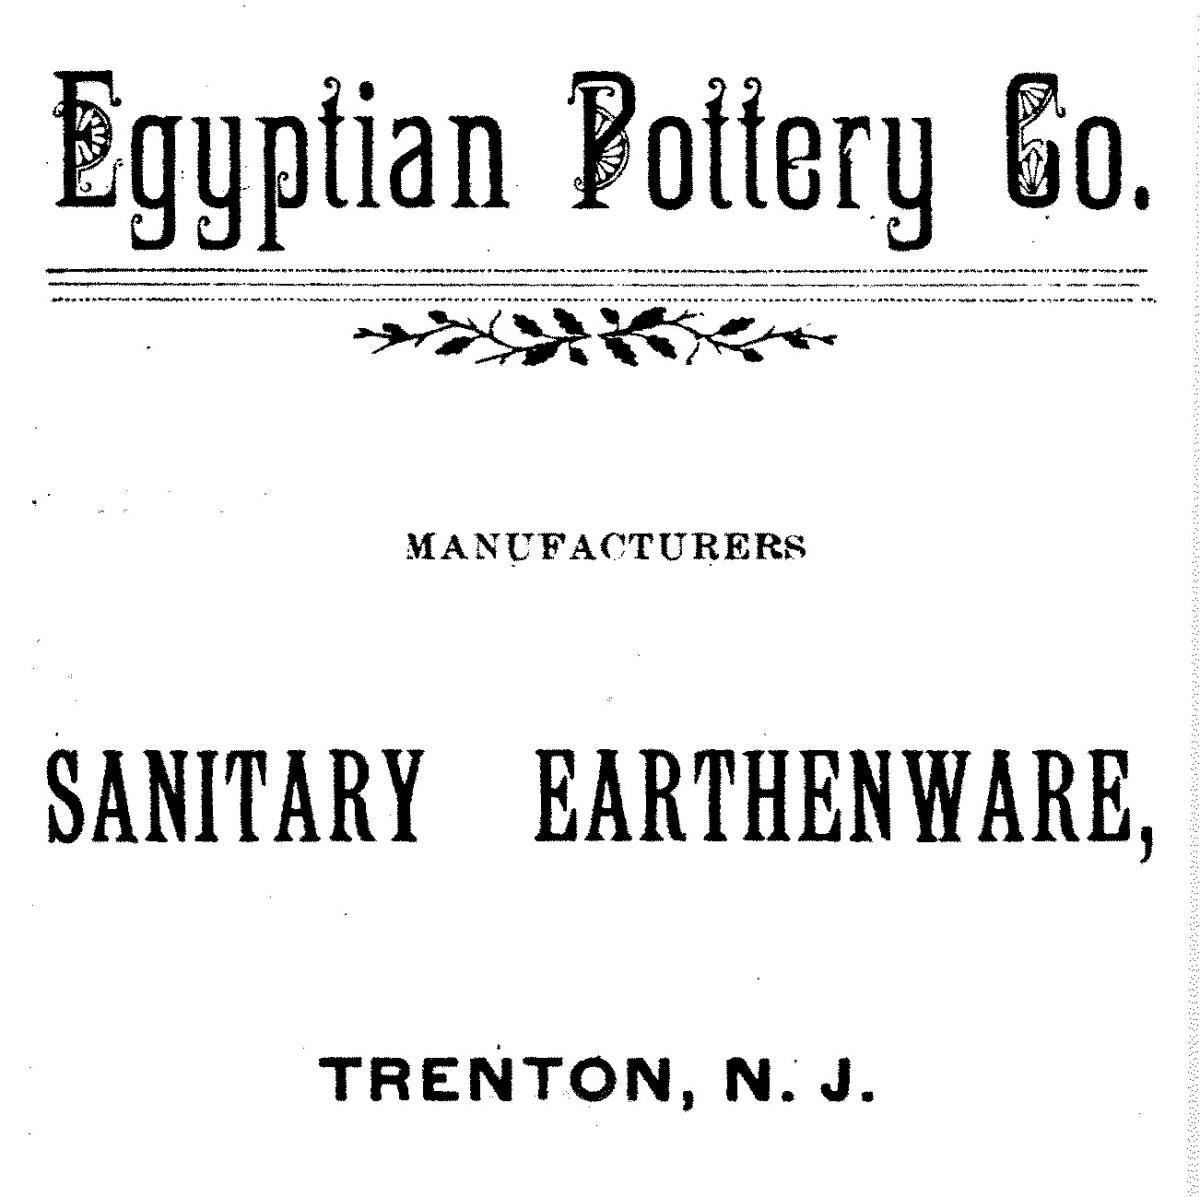 Egyptian Pottery Company Advertisement